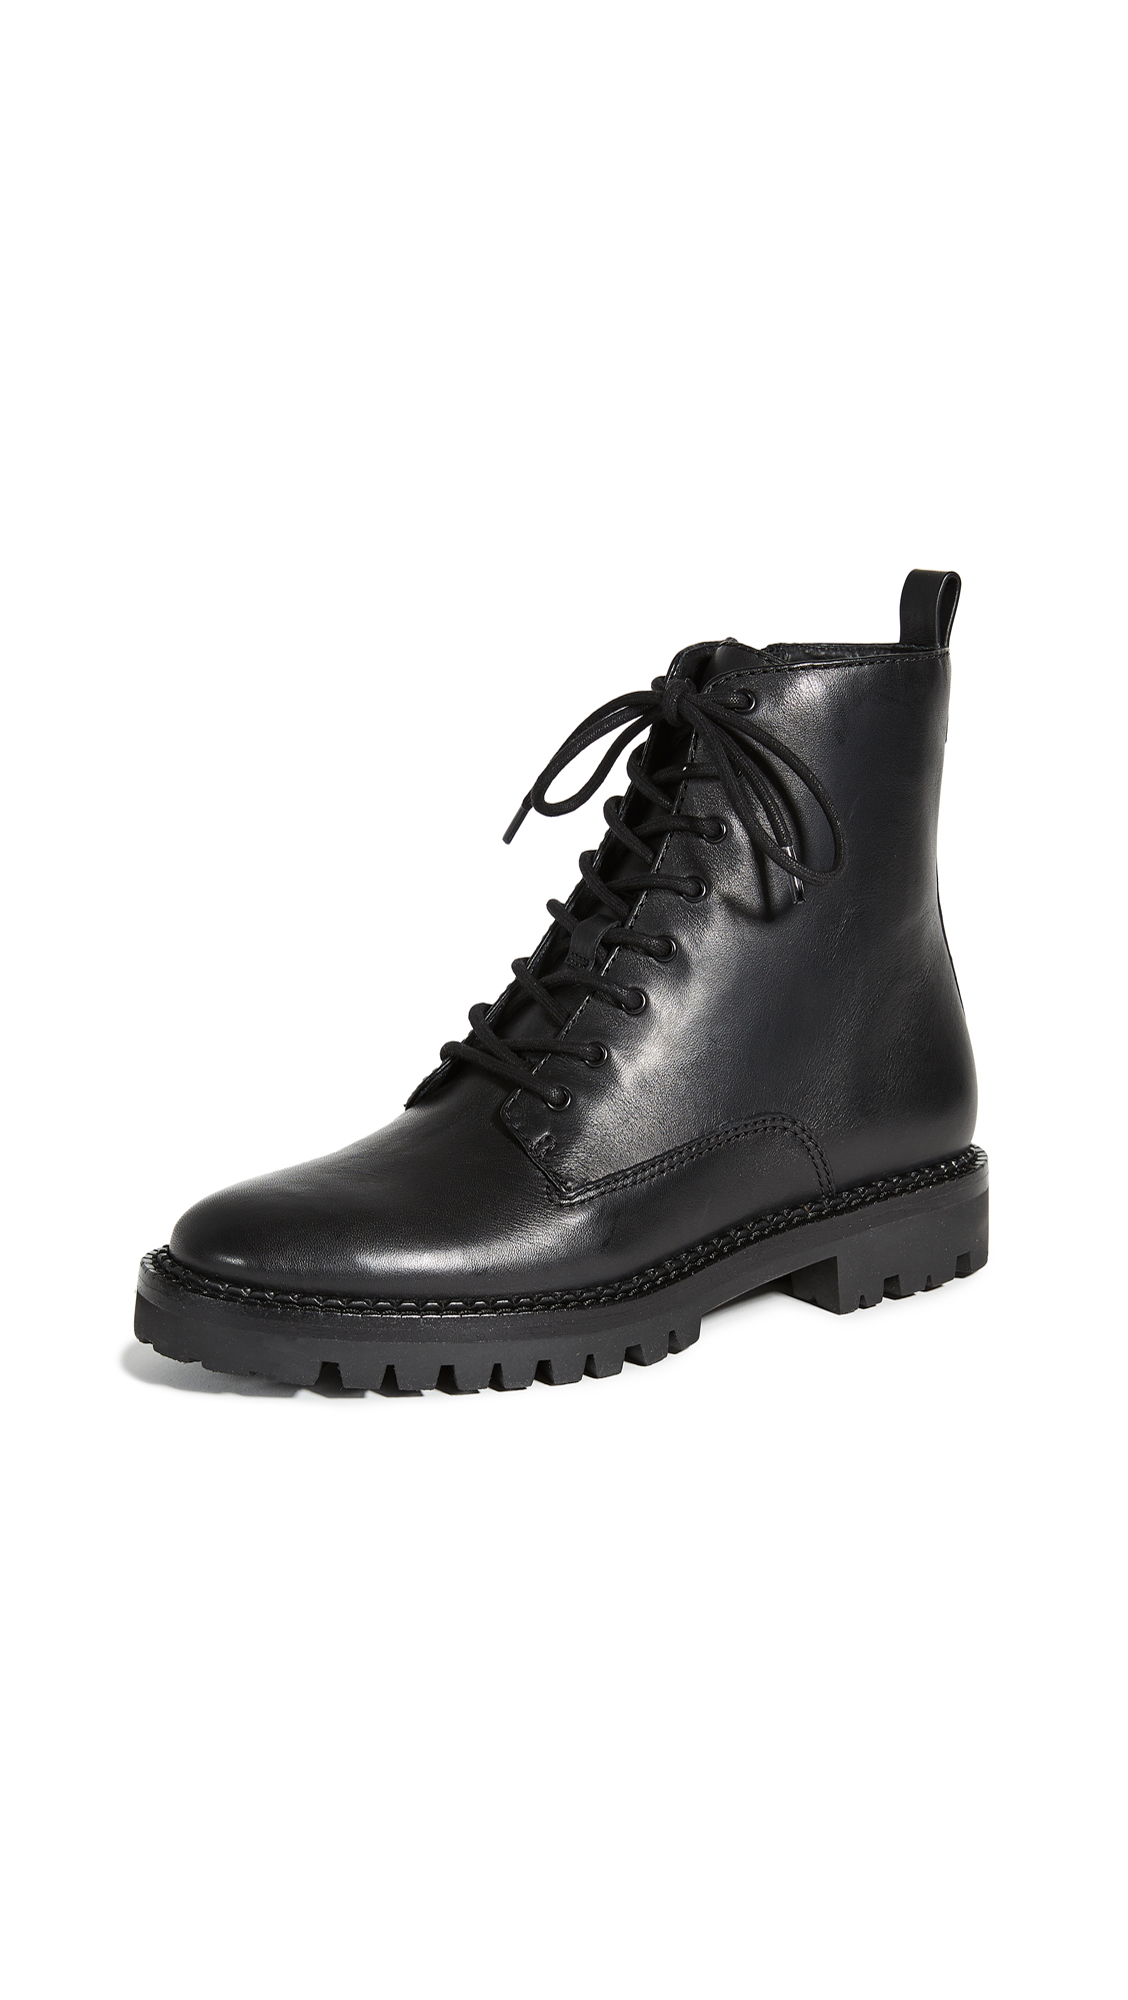 Vince Cabria Lug Sole Boots